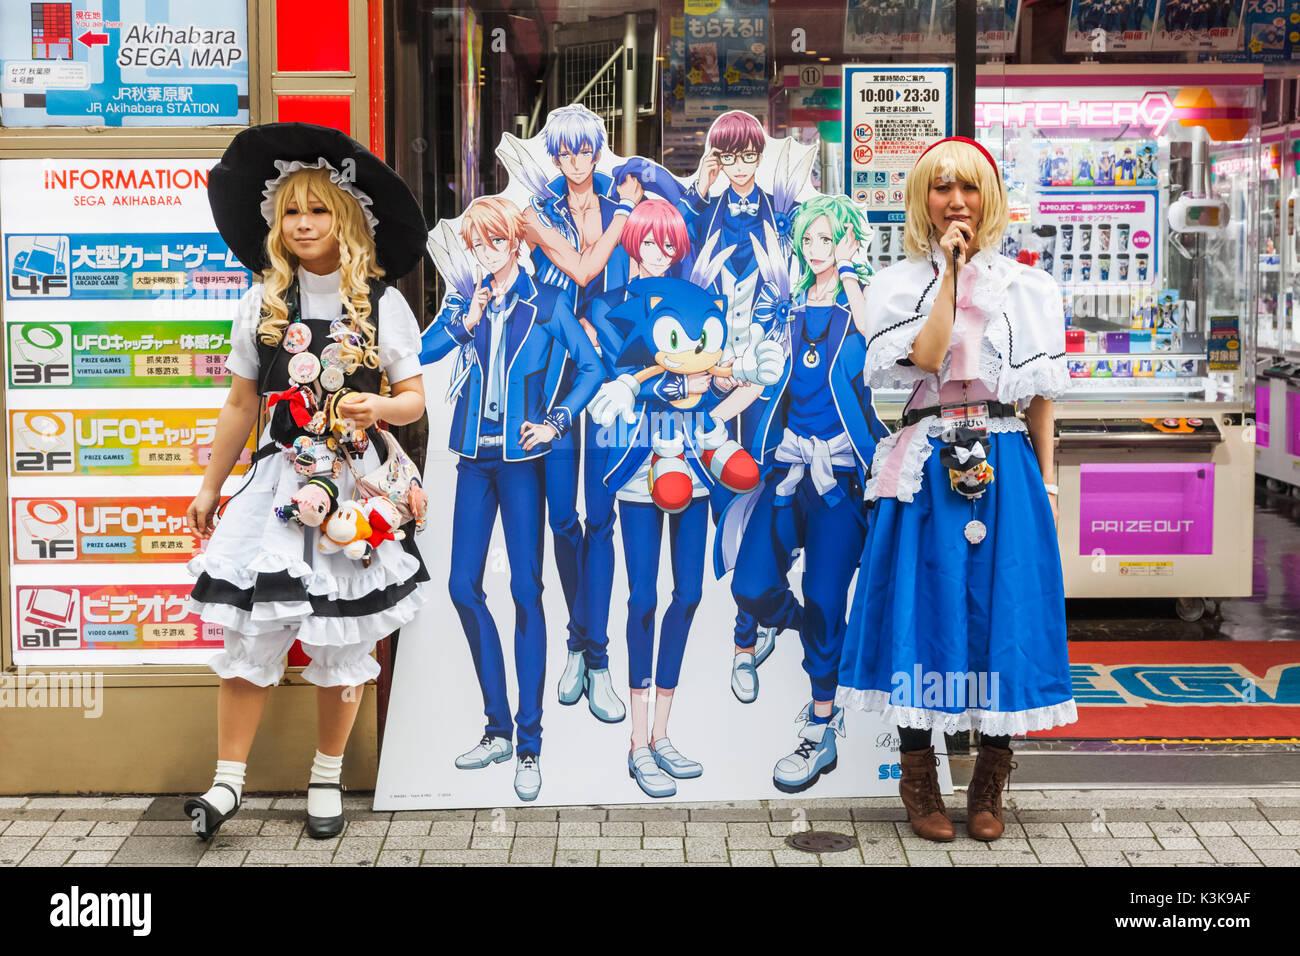 Japan, Hoshu, Tokyo, Akihabara, Gaming Centre Entrance, Girls Promoting New Games - Stock Image